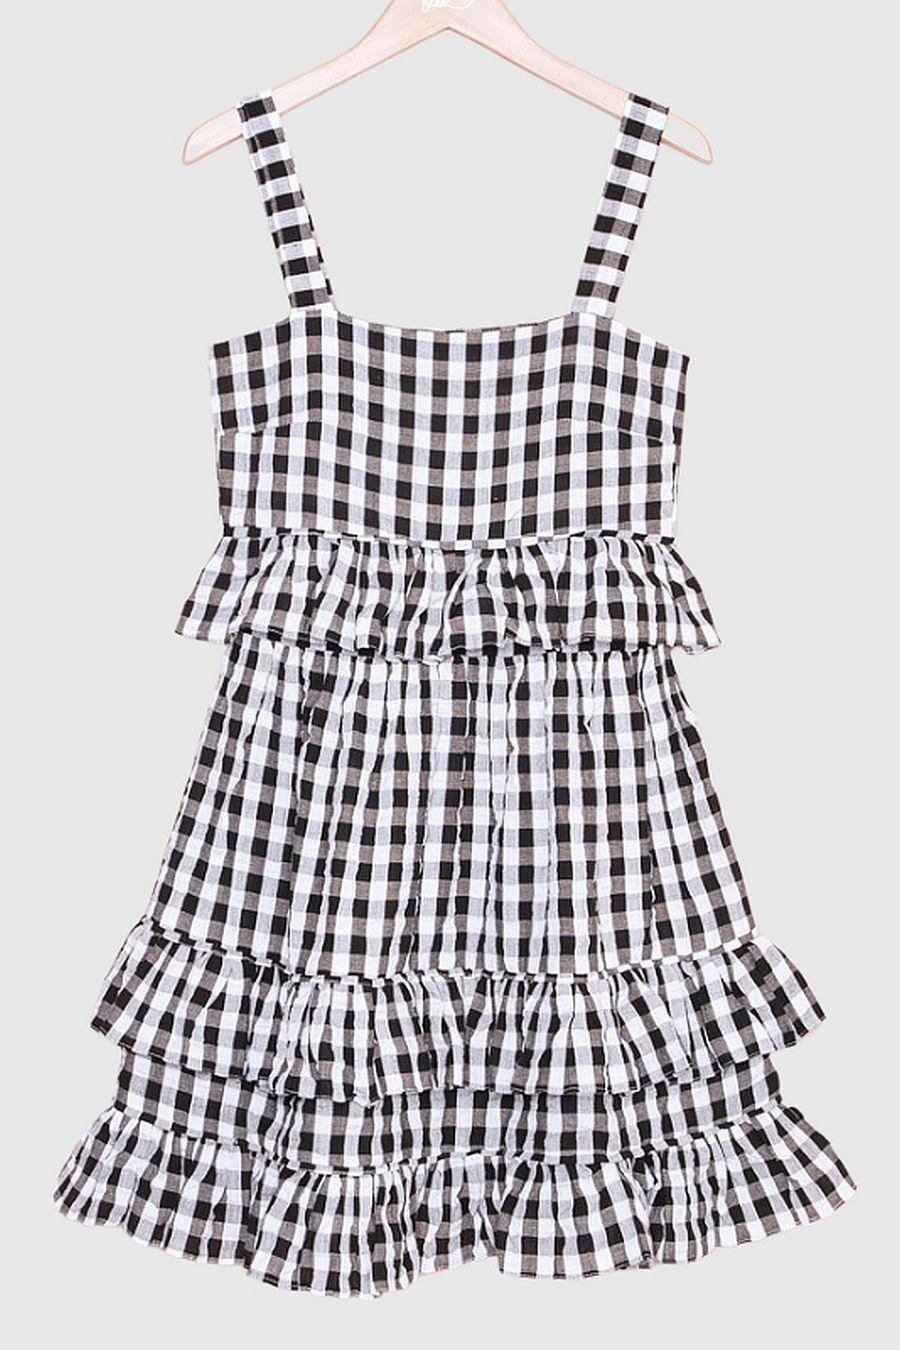 Tach Clothing Amaral Dress - Black